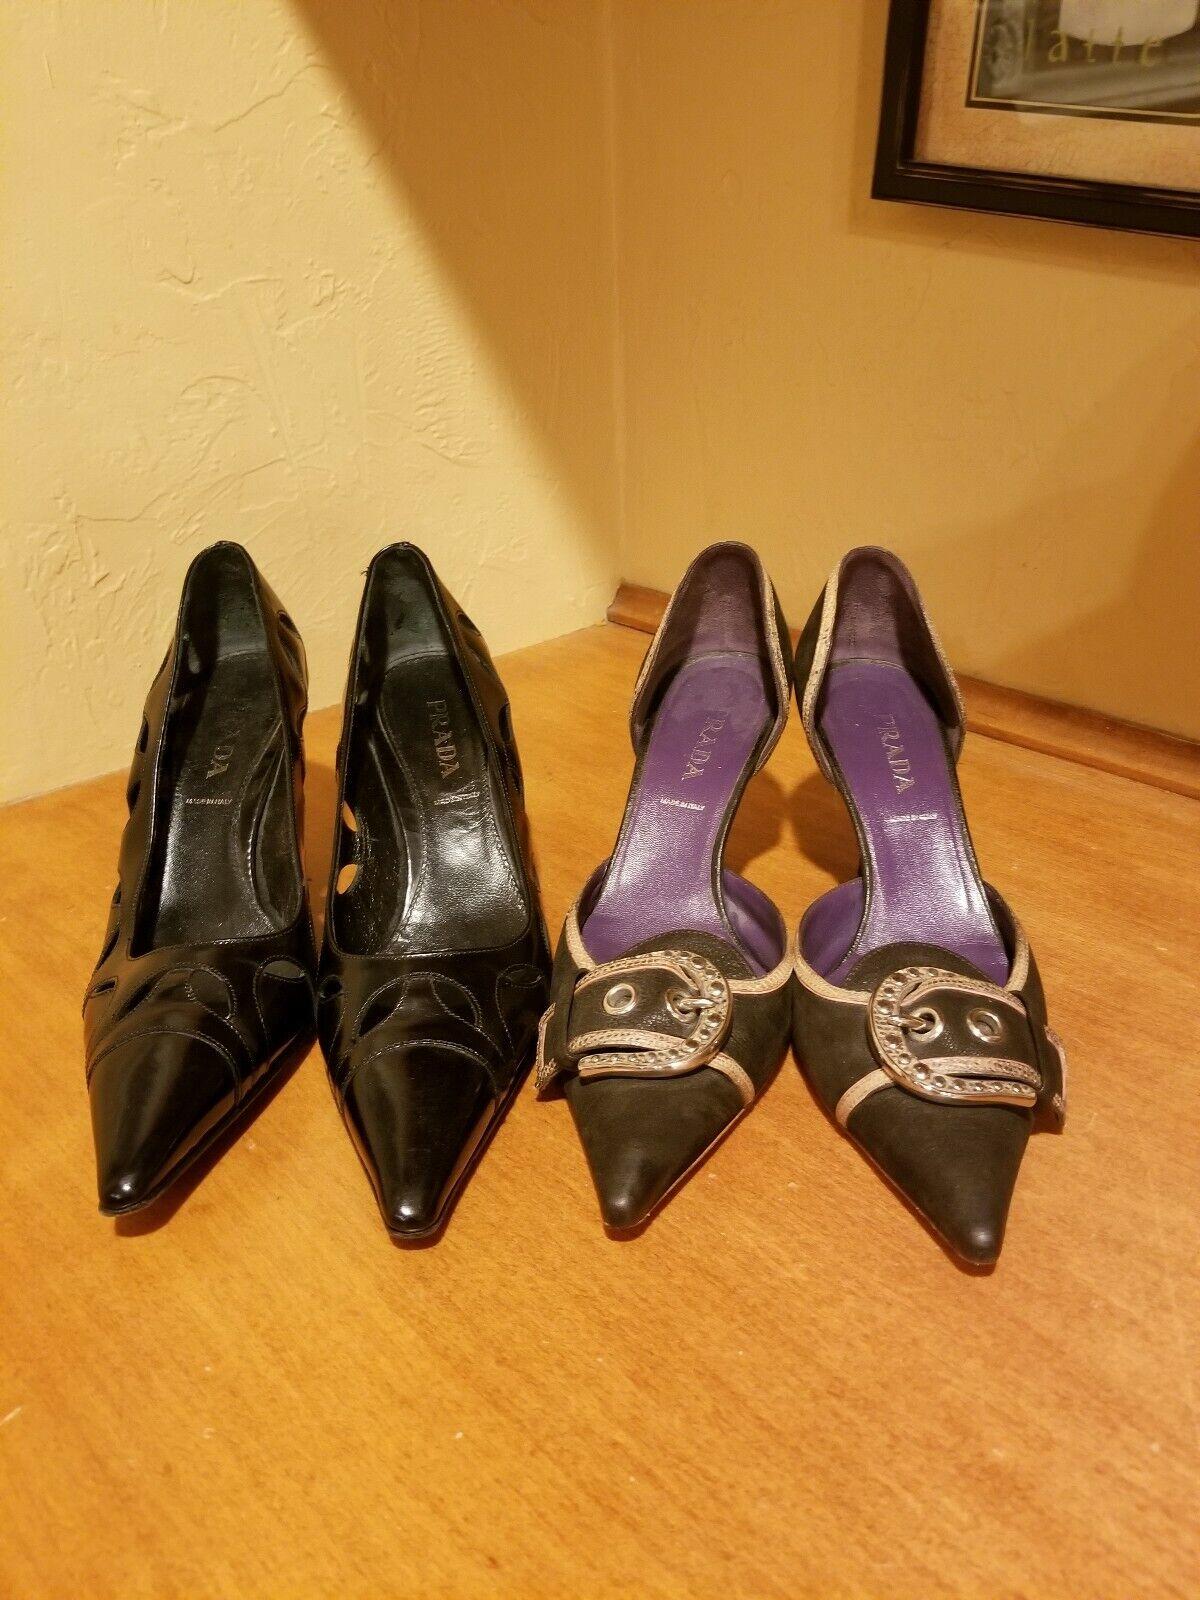 2 Pair of Authentic Prada Leather gattino Heels calibro  38.5 o 8  caldo